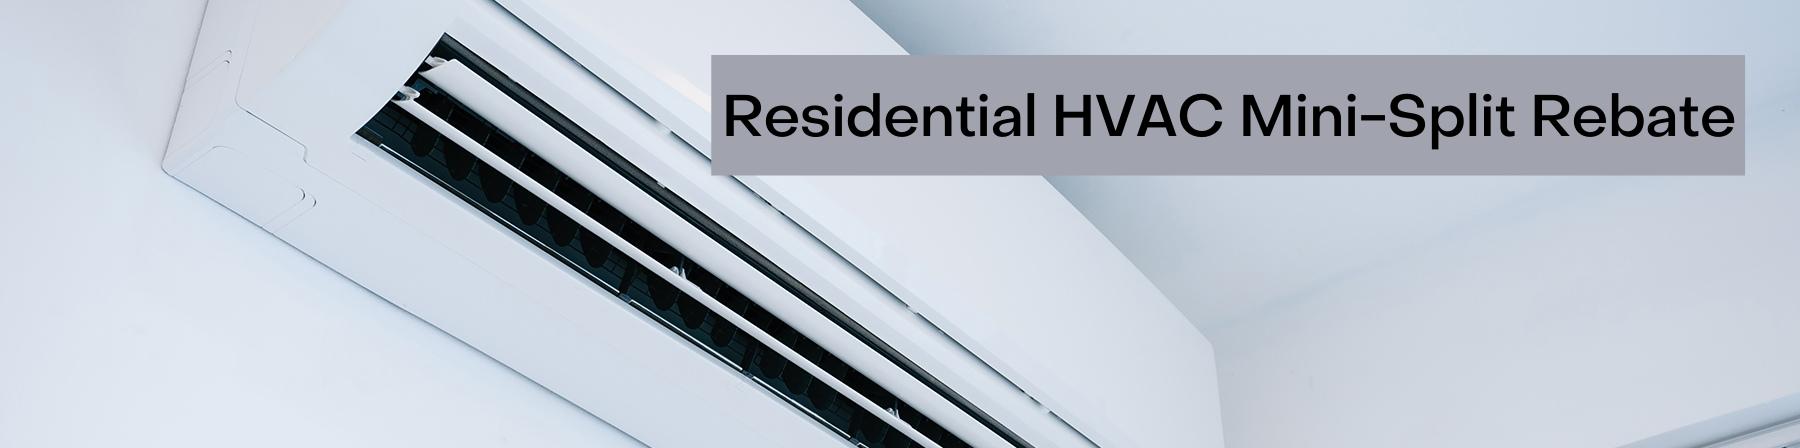 ResidentaHVAC Mini-Split Rebate